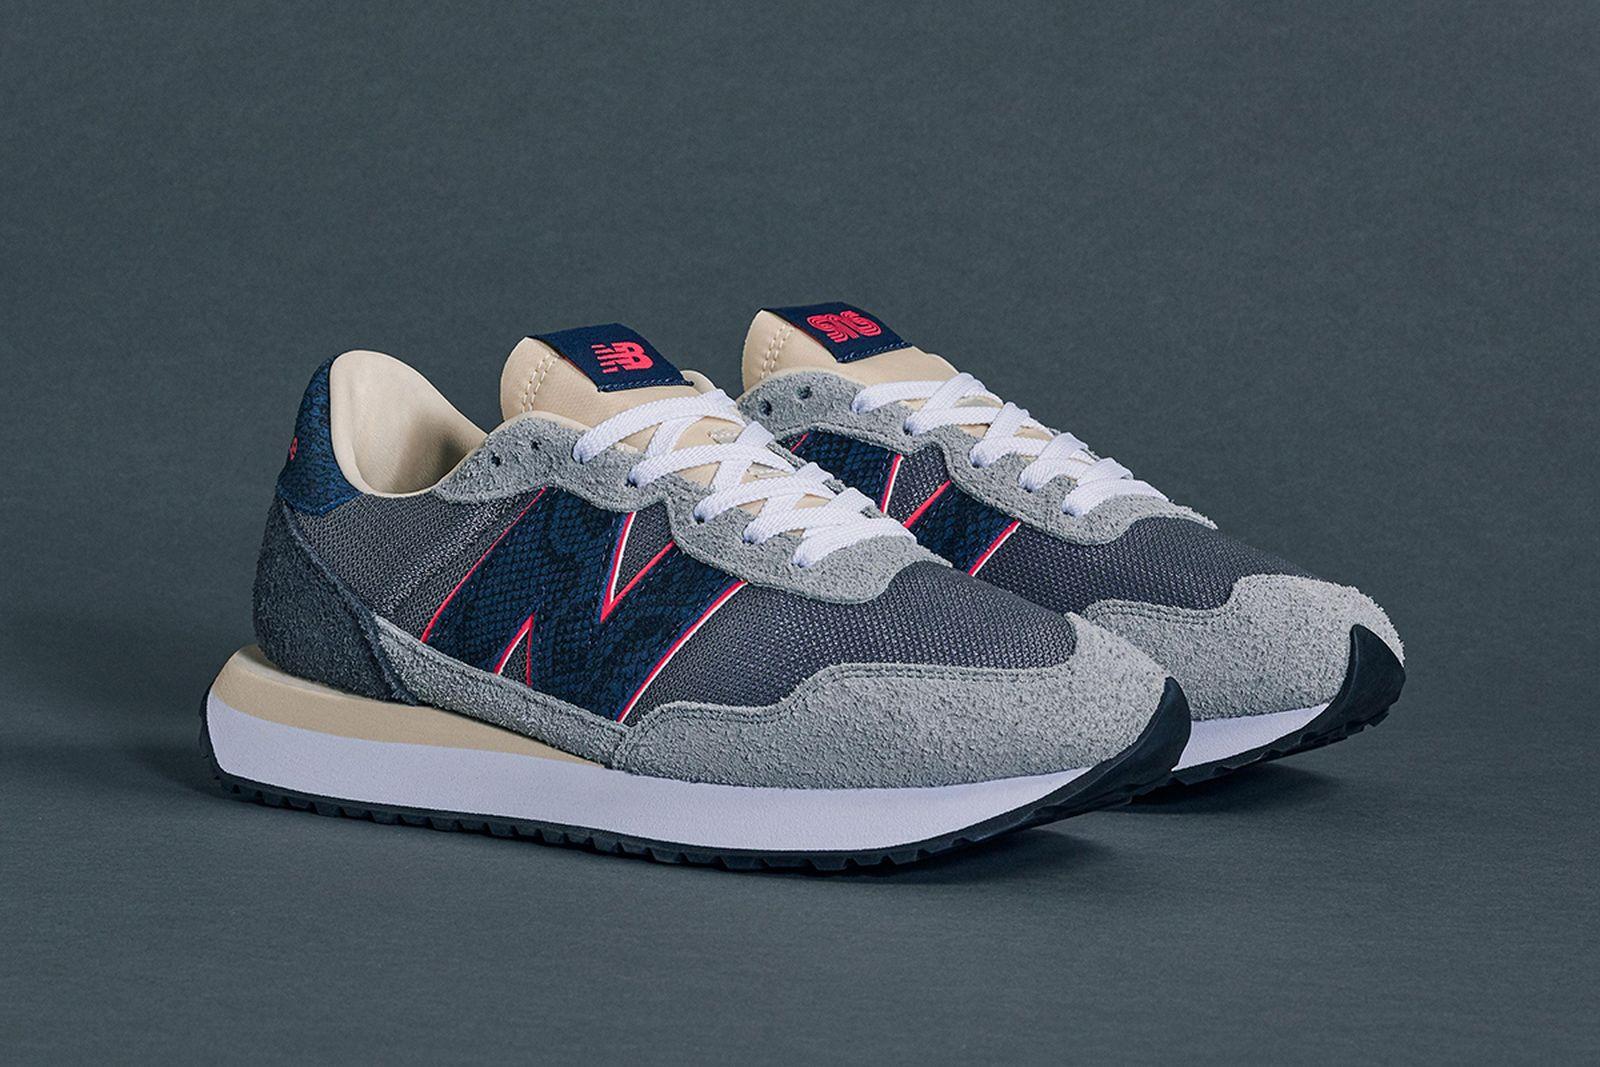 sneakersnstuff-new-balance-237-release-date-price-09